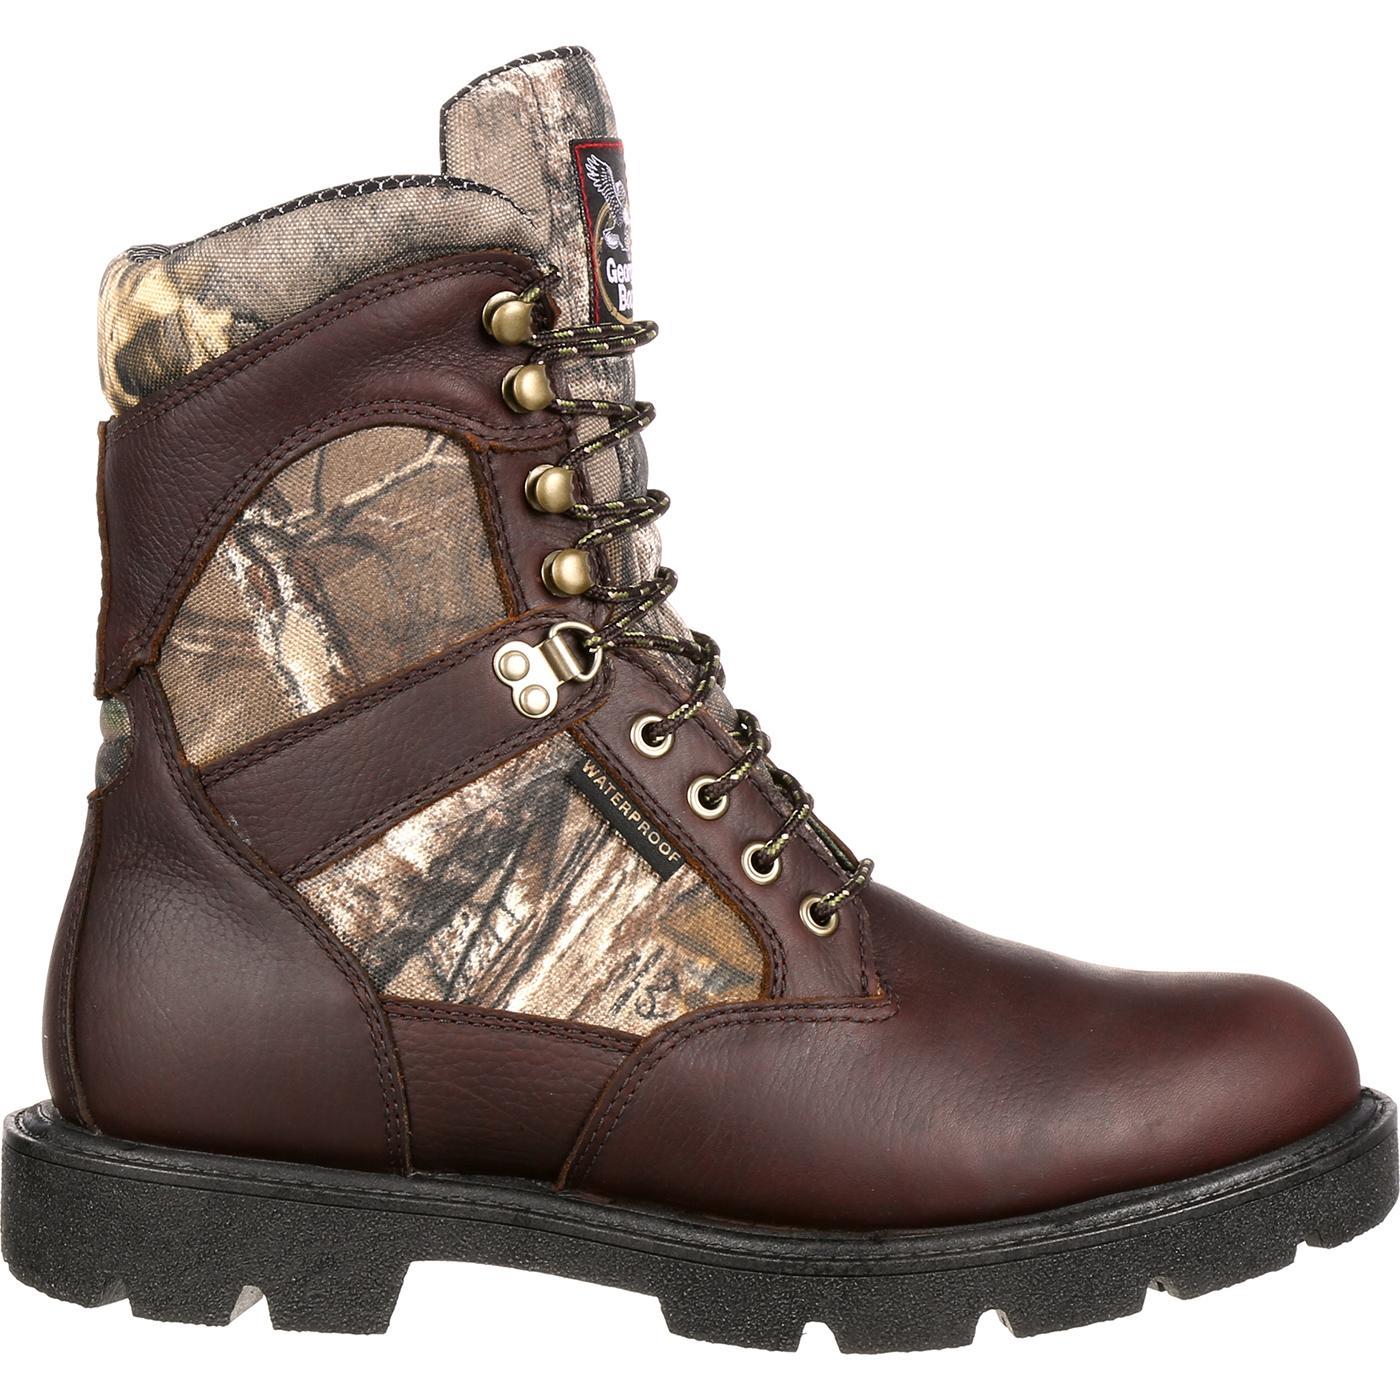 64c49991d97 Georgia Boot Homeland Waterproof Insulated Boot